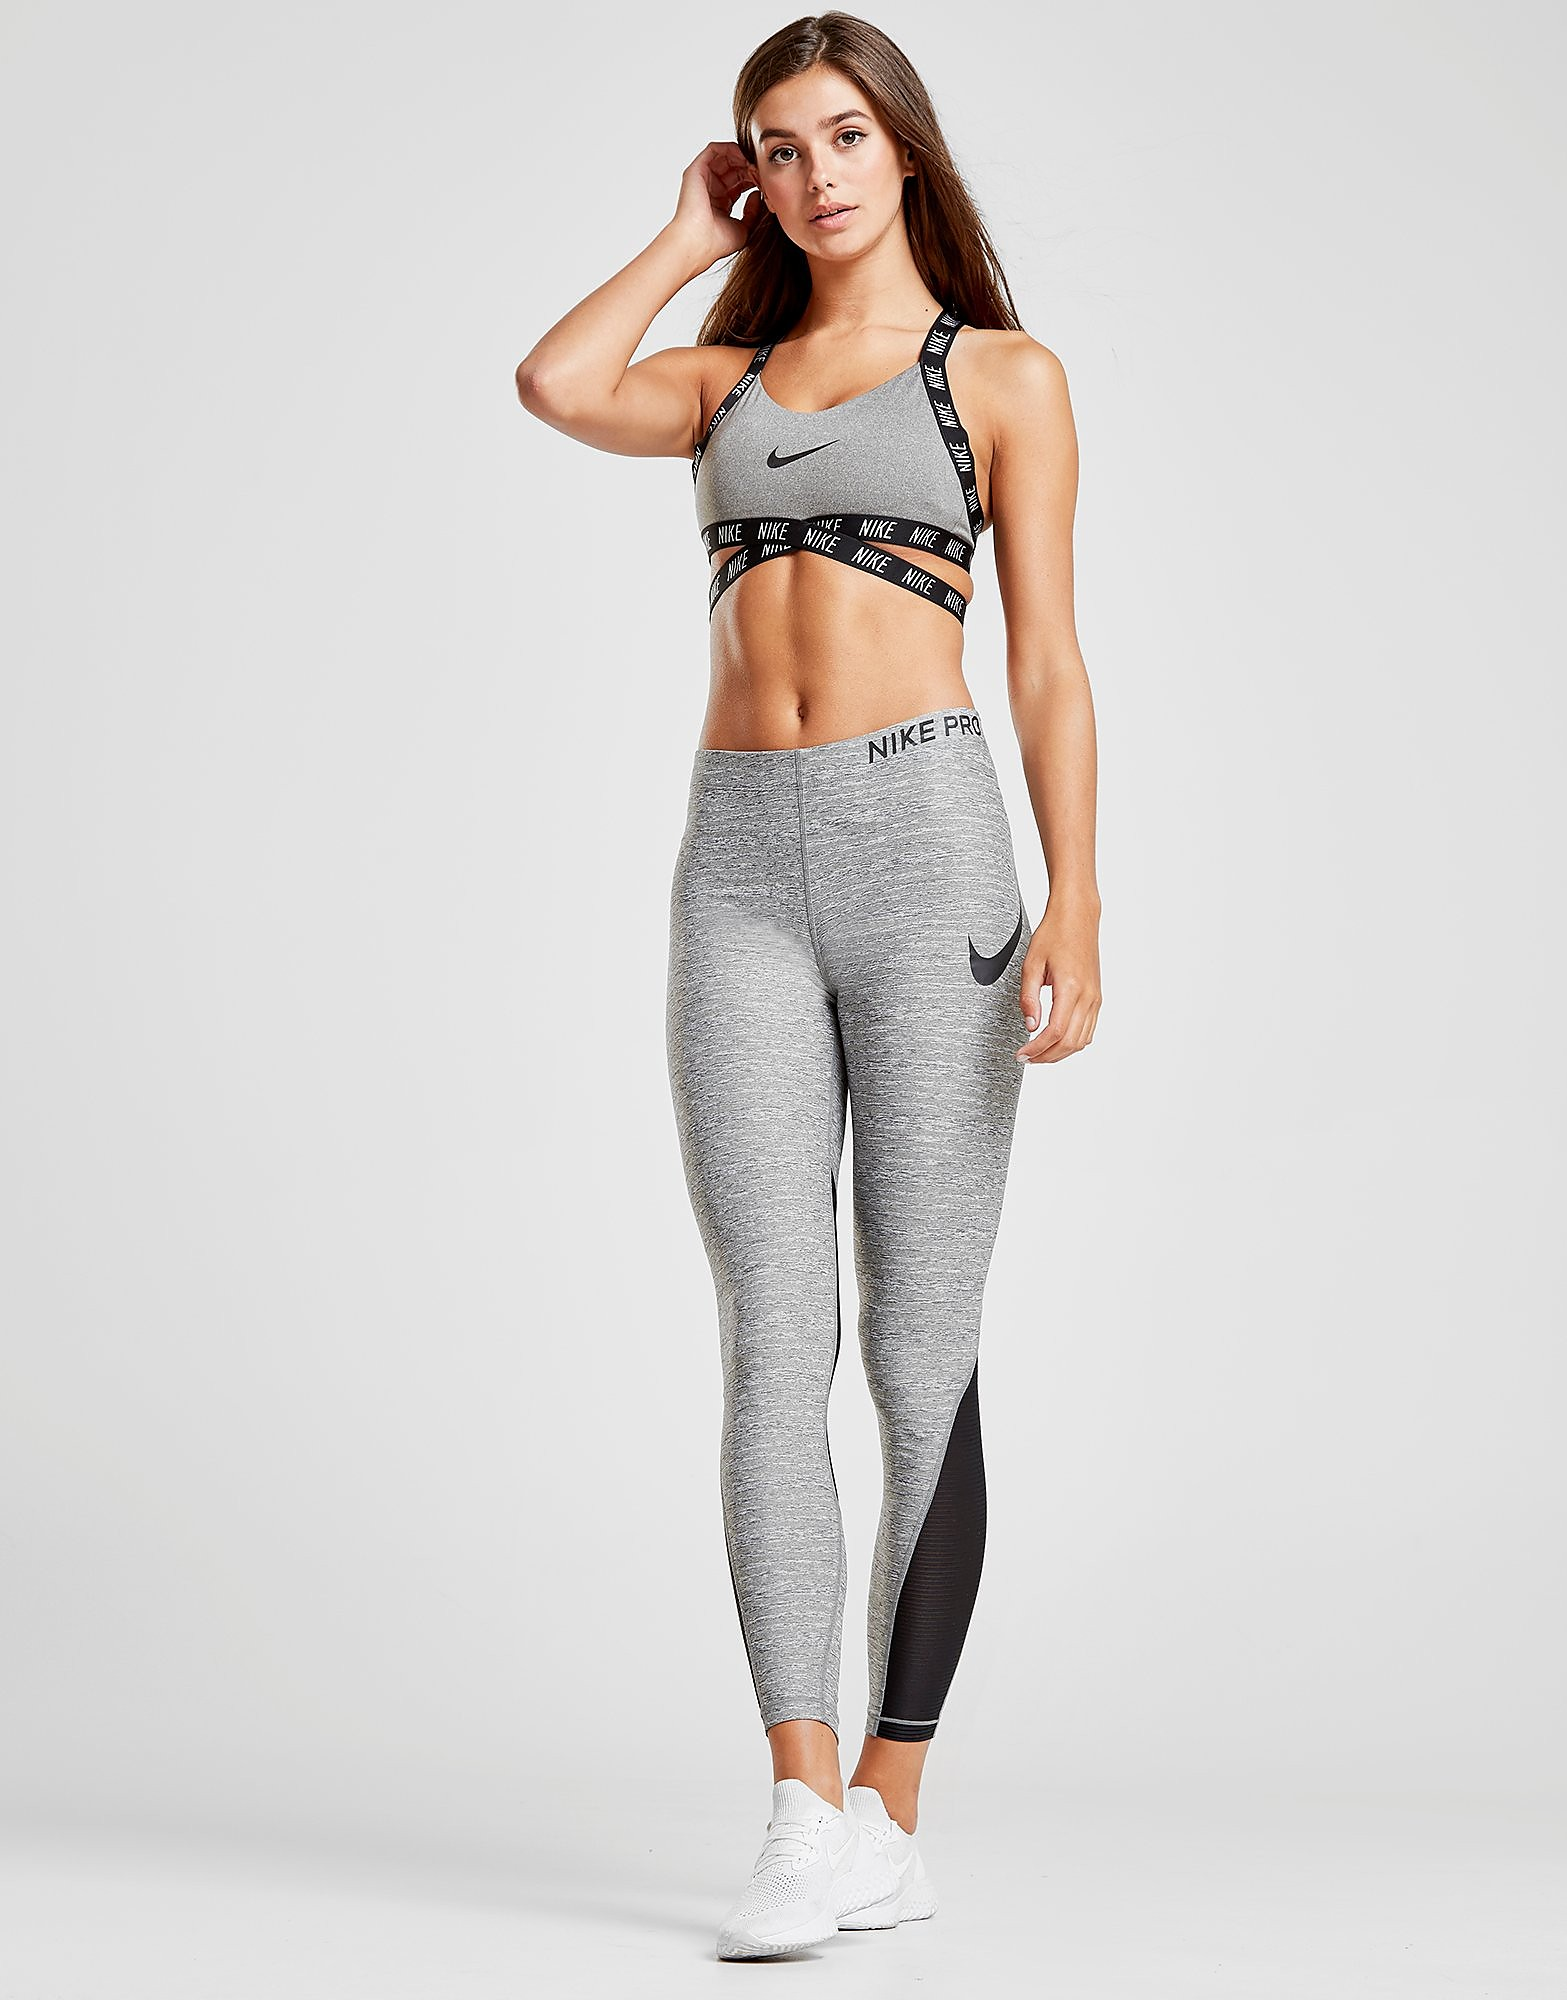 Nike Collants Pro Femme